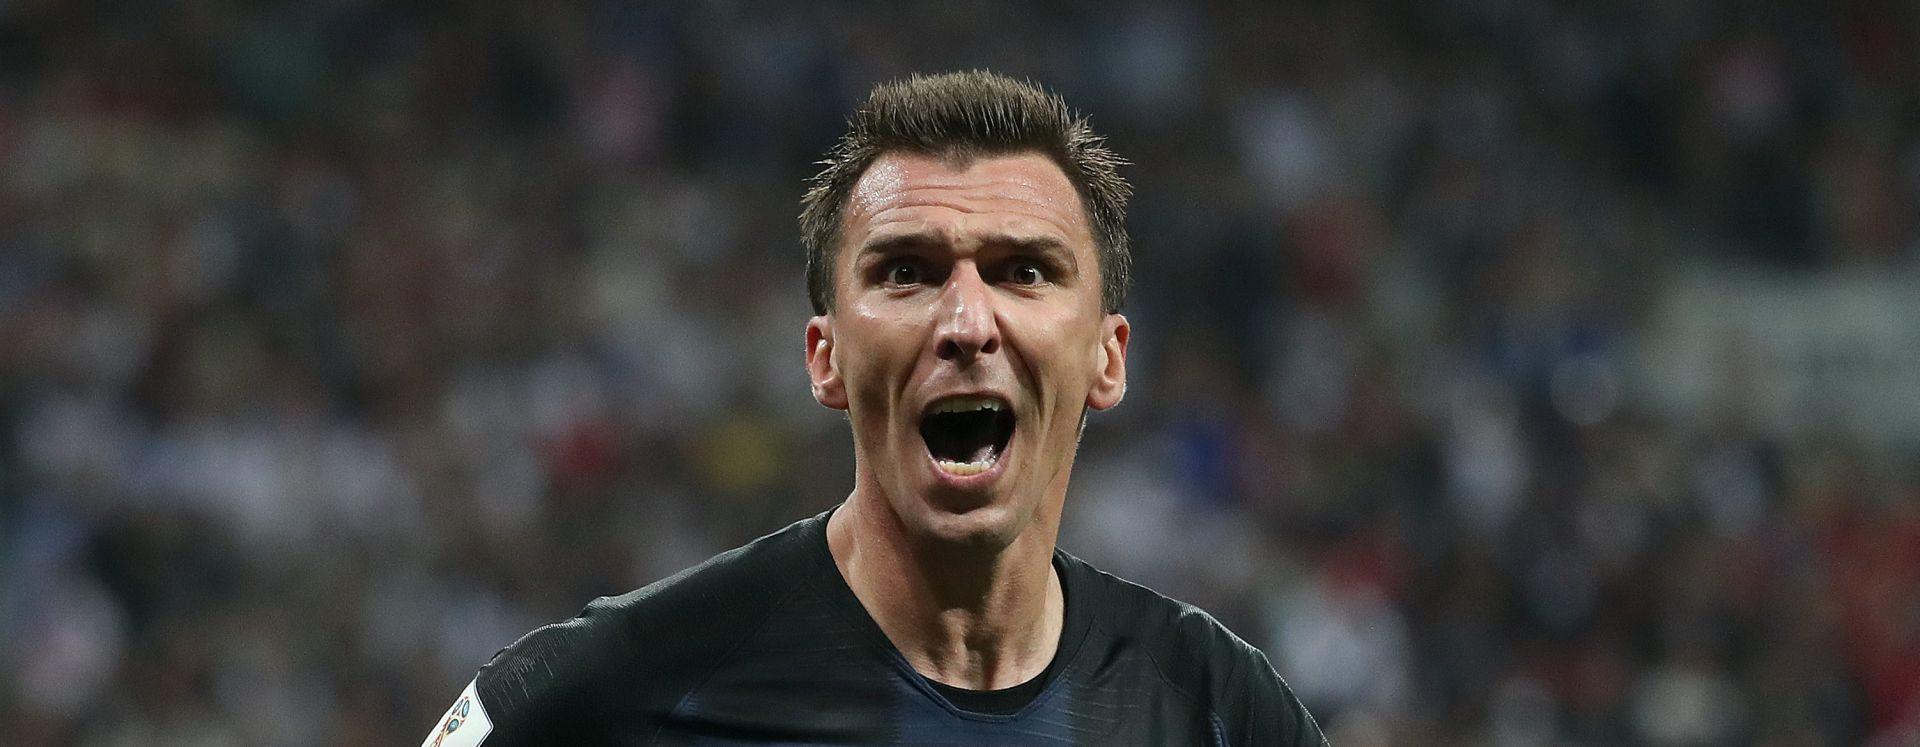 Mandžukić kapetan Juventusa?